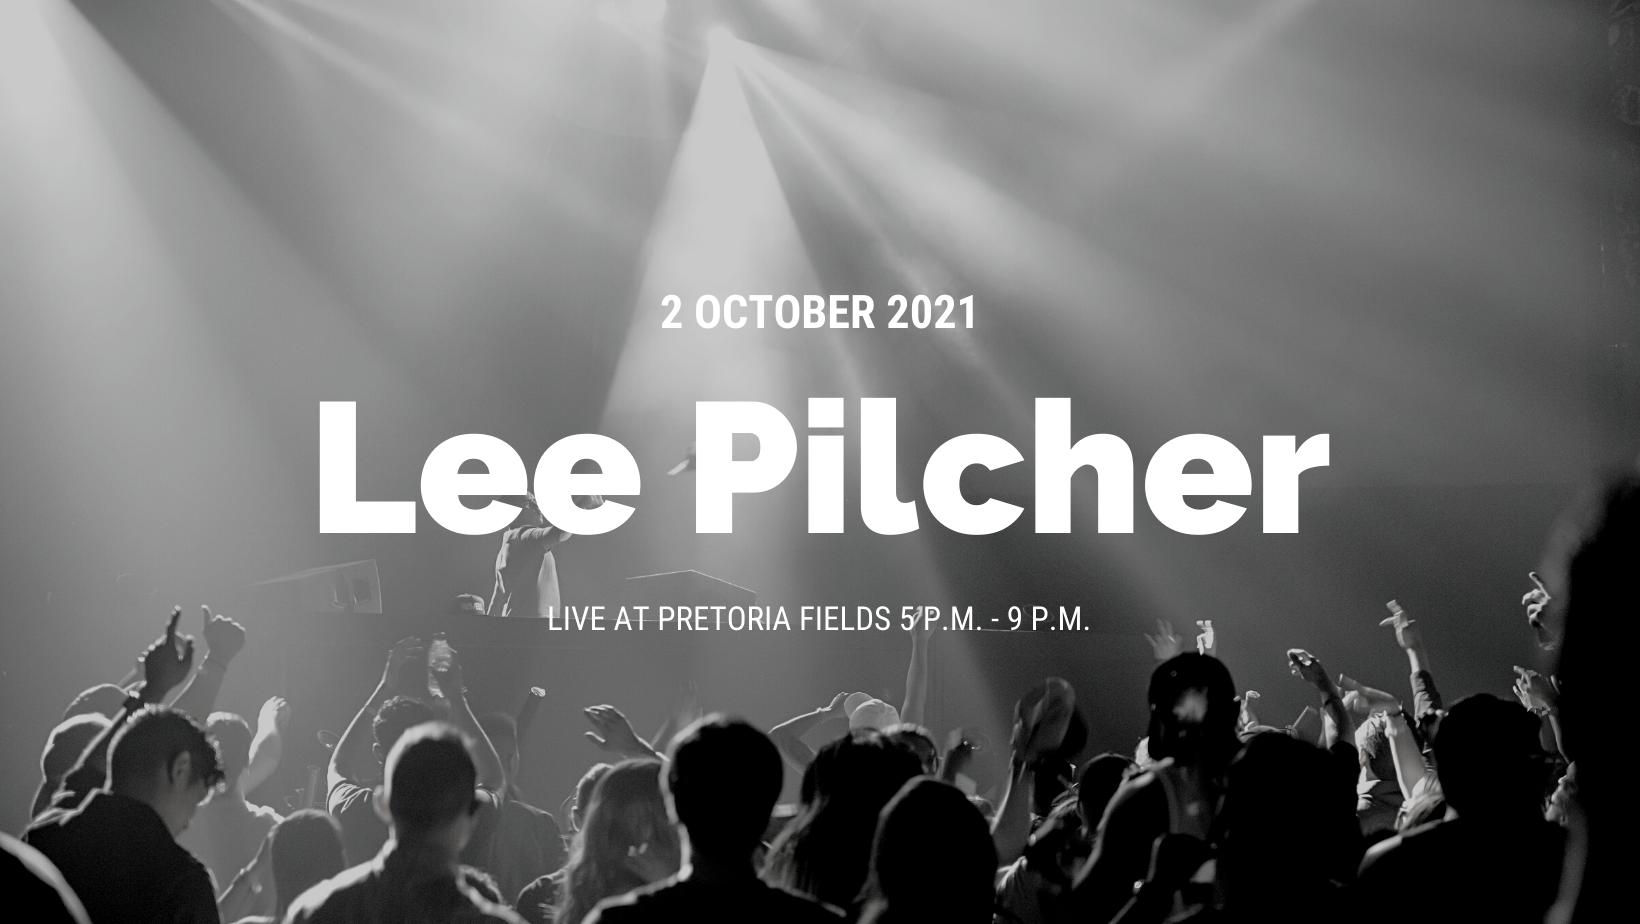 Lee Pilcher Live at Pretoria Fields